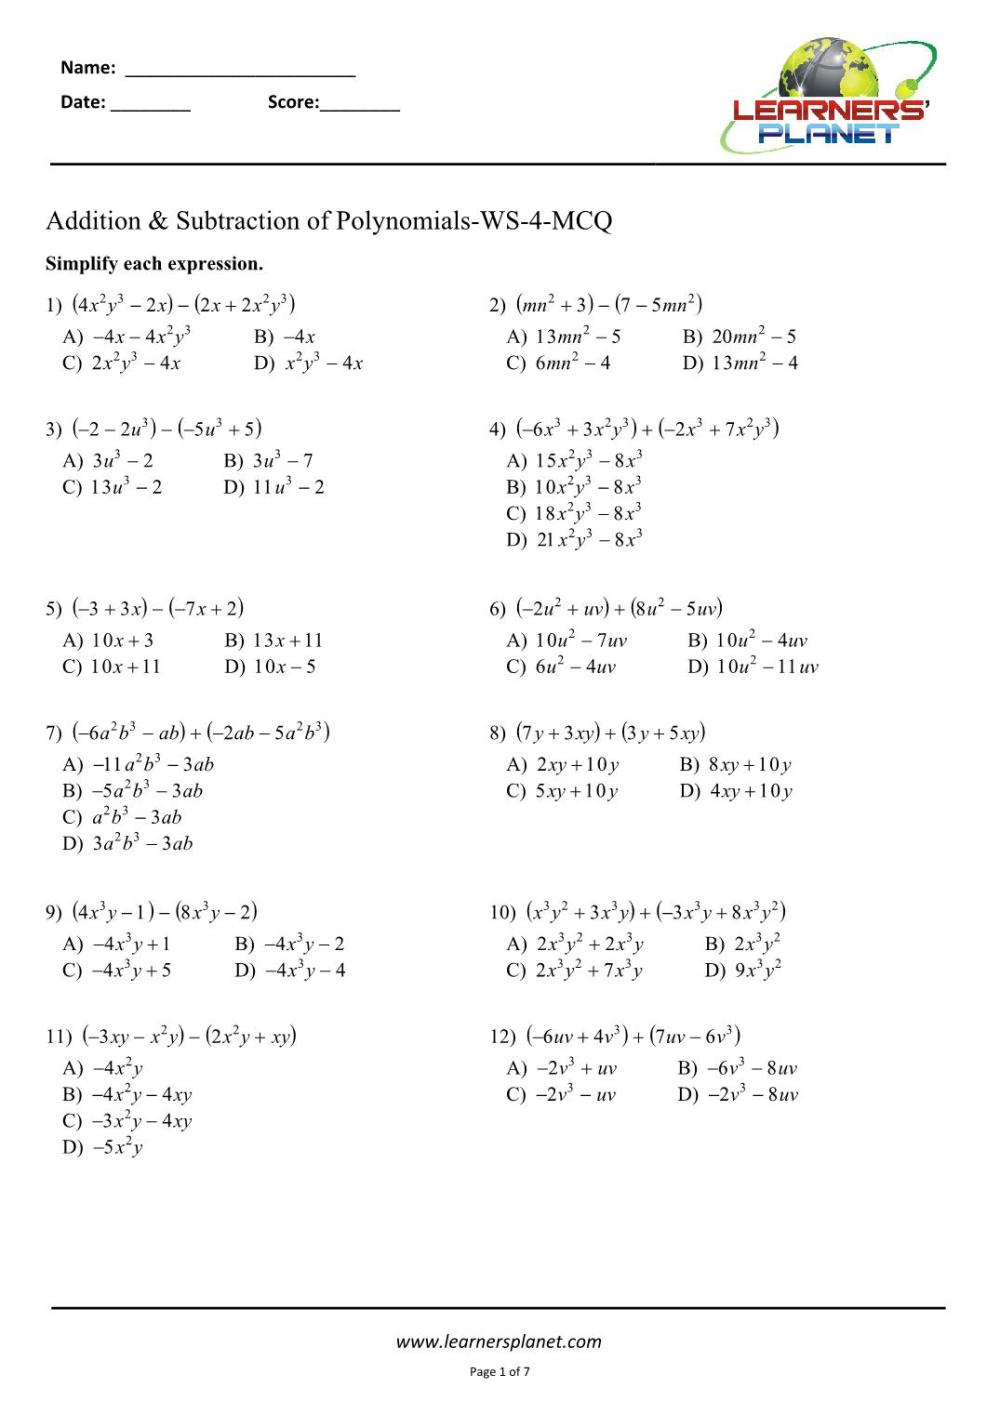 medium resolution of Addition-Subtraction-of-Polynomials-Workbook-2